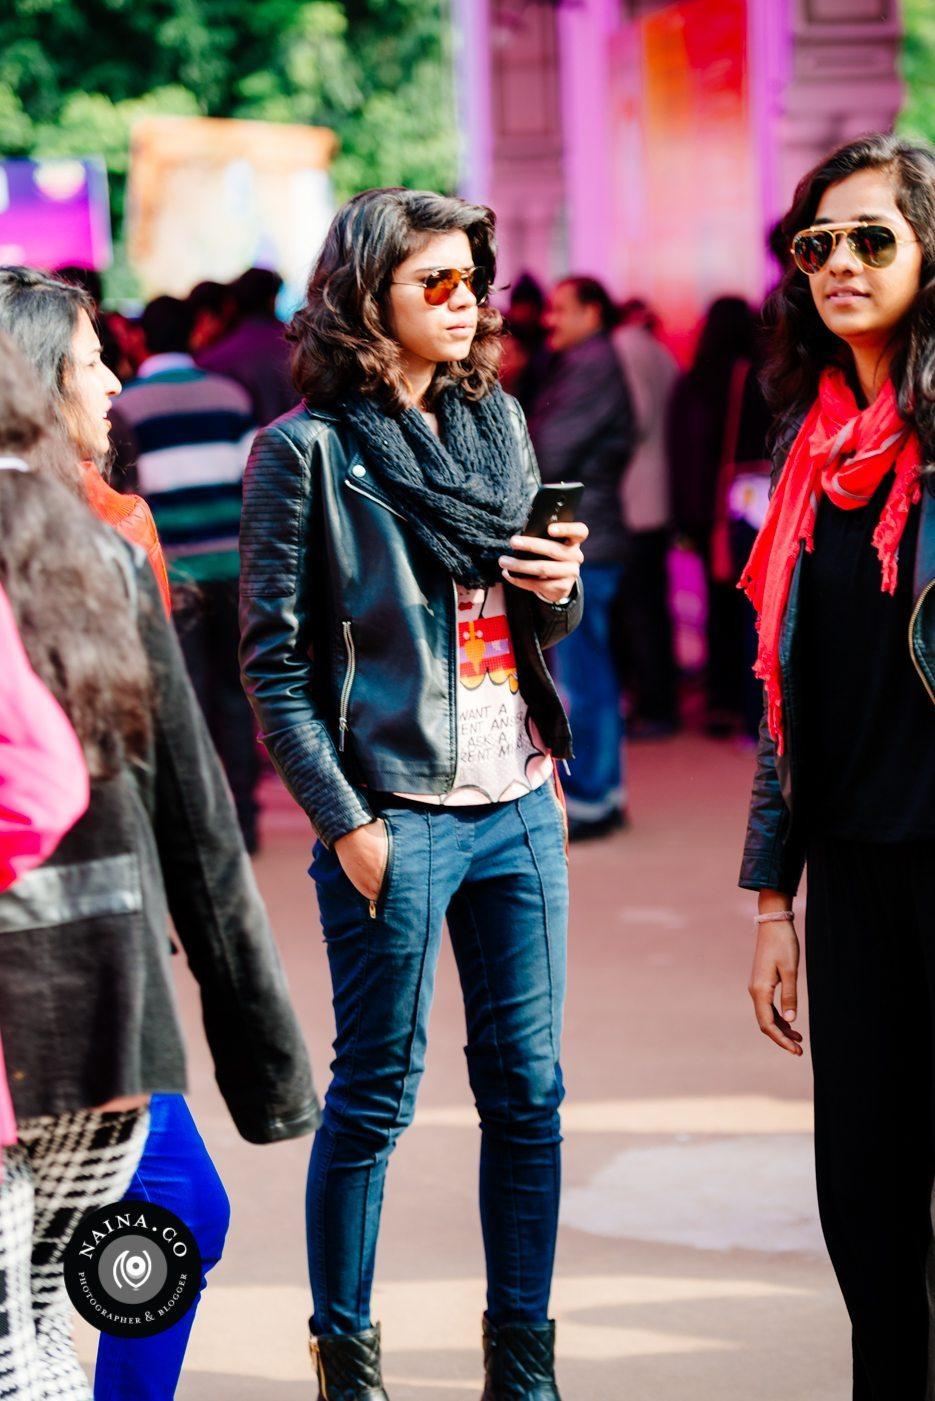 Naina.co-Raconteuse-Visuelle-Photographer-Blogger-Storyteller-Luxury-Lifestyle-January-2015-Jaipur-Literature-Festival-StRegis-LeMeridien-ZeeJLF-EyesForStreetStyle-44